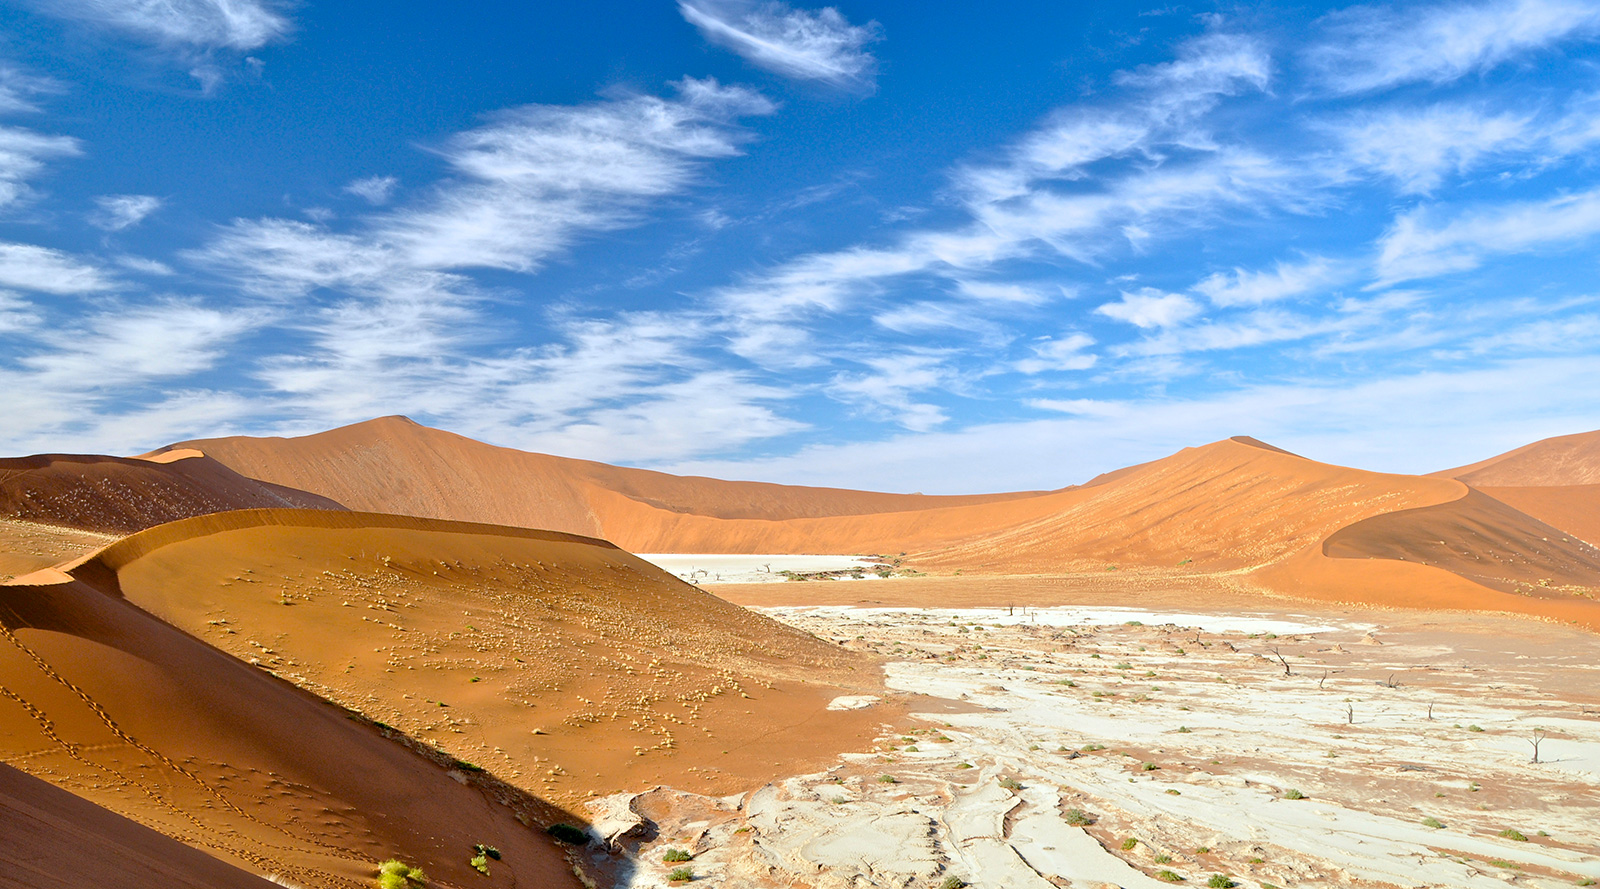 © Benedetta Mazzini | Sossusvlei, Namib Desert, Namibia